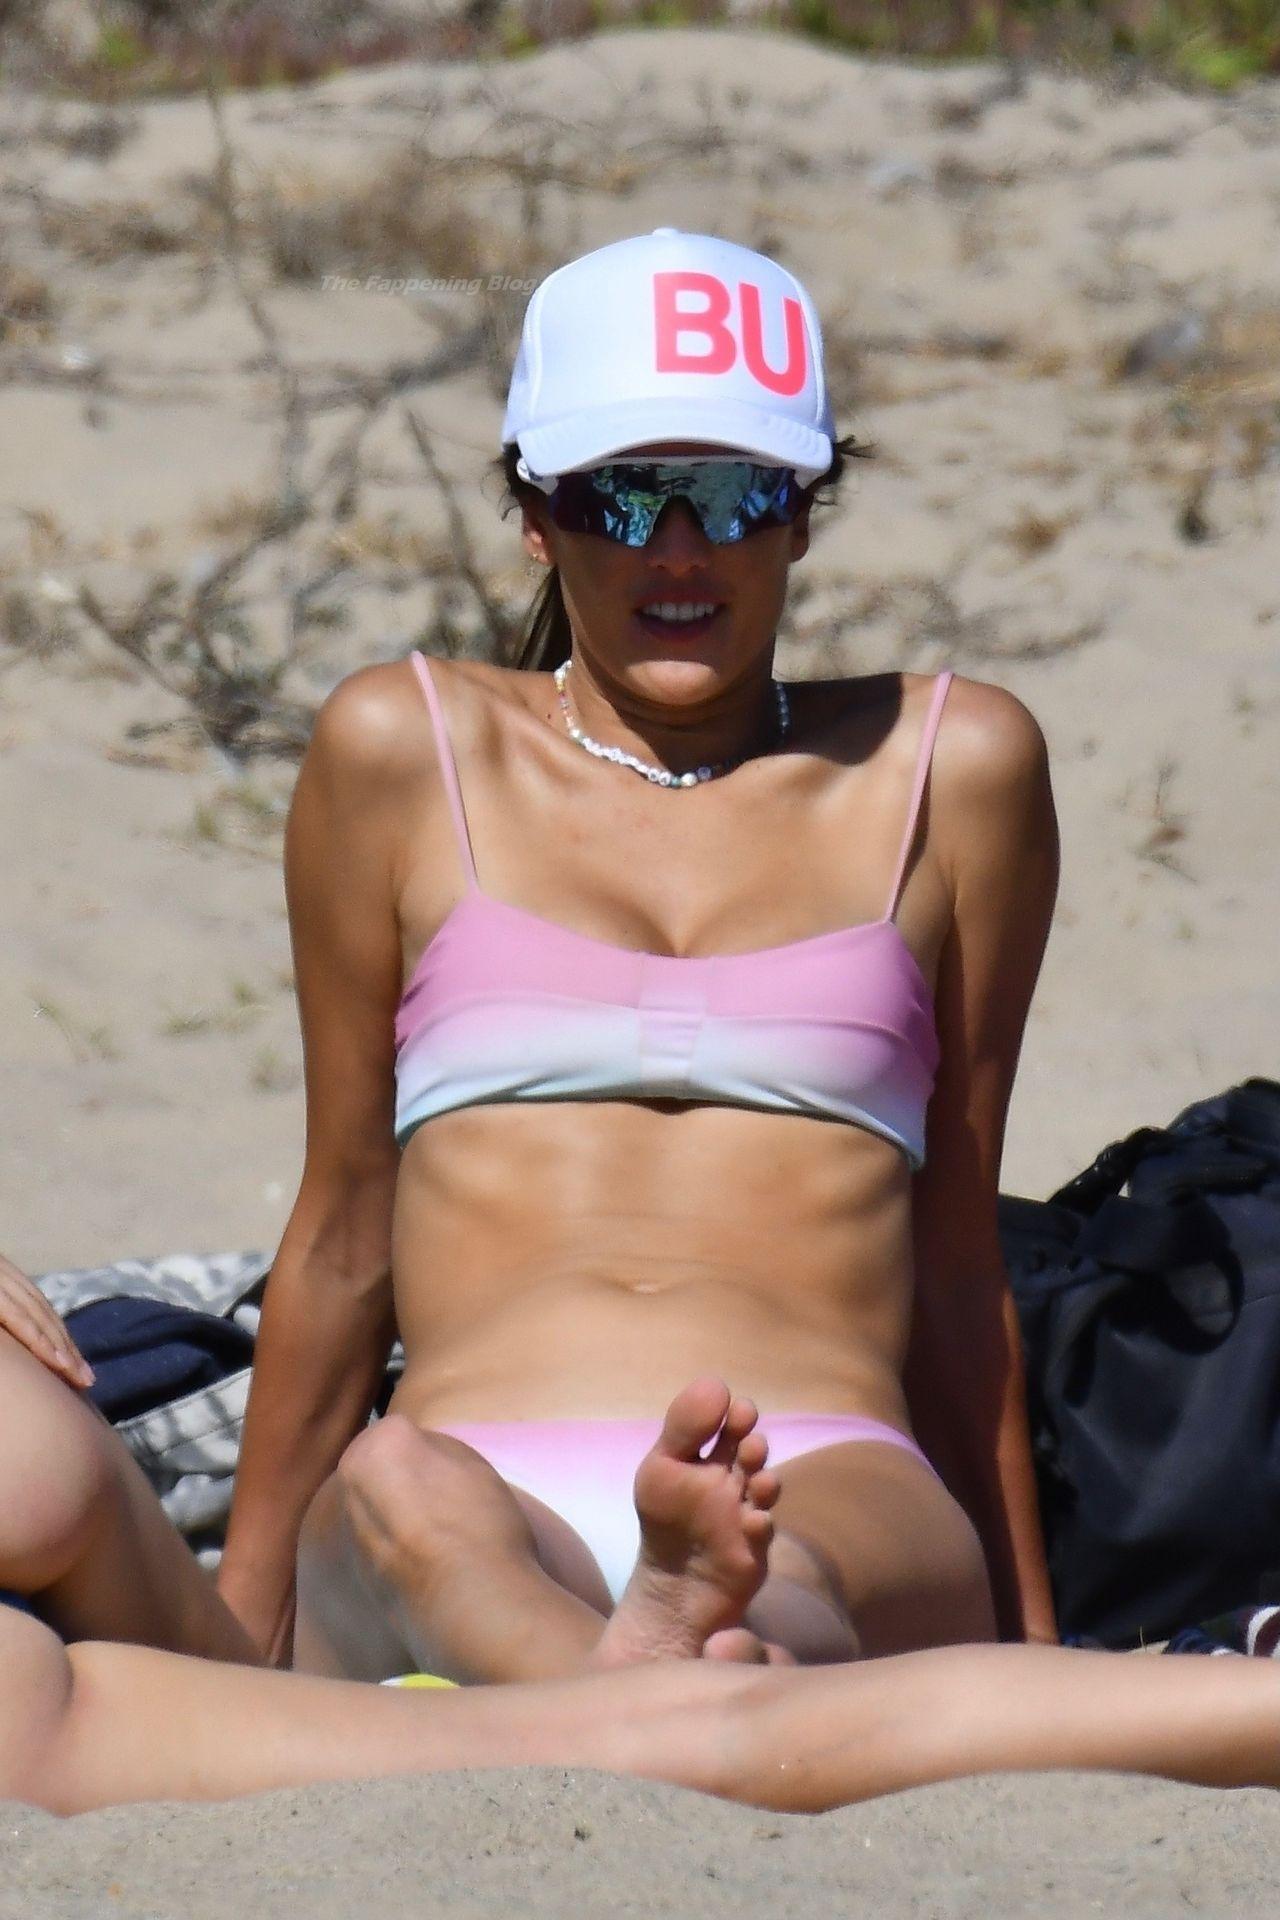 Alessandra-Ambrosio-Sexy-The-Fappening-Blog-88.jpg